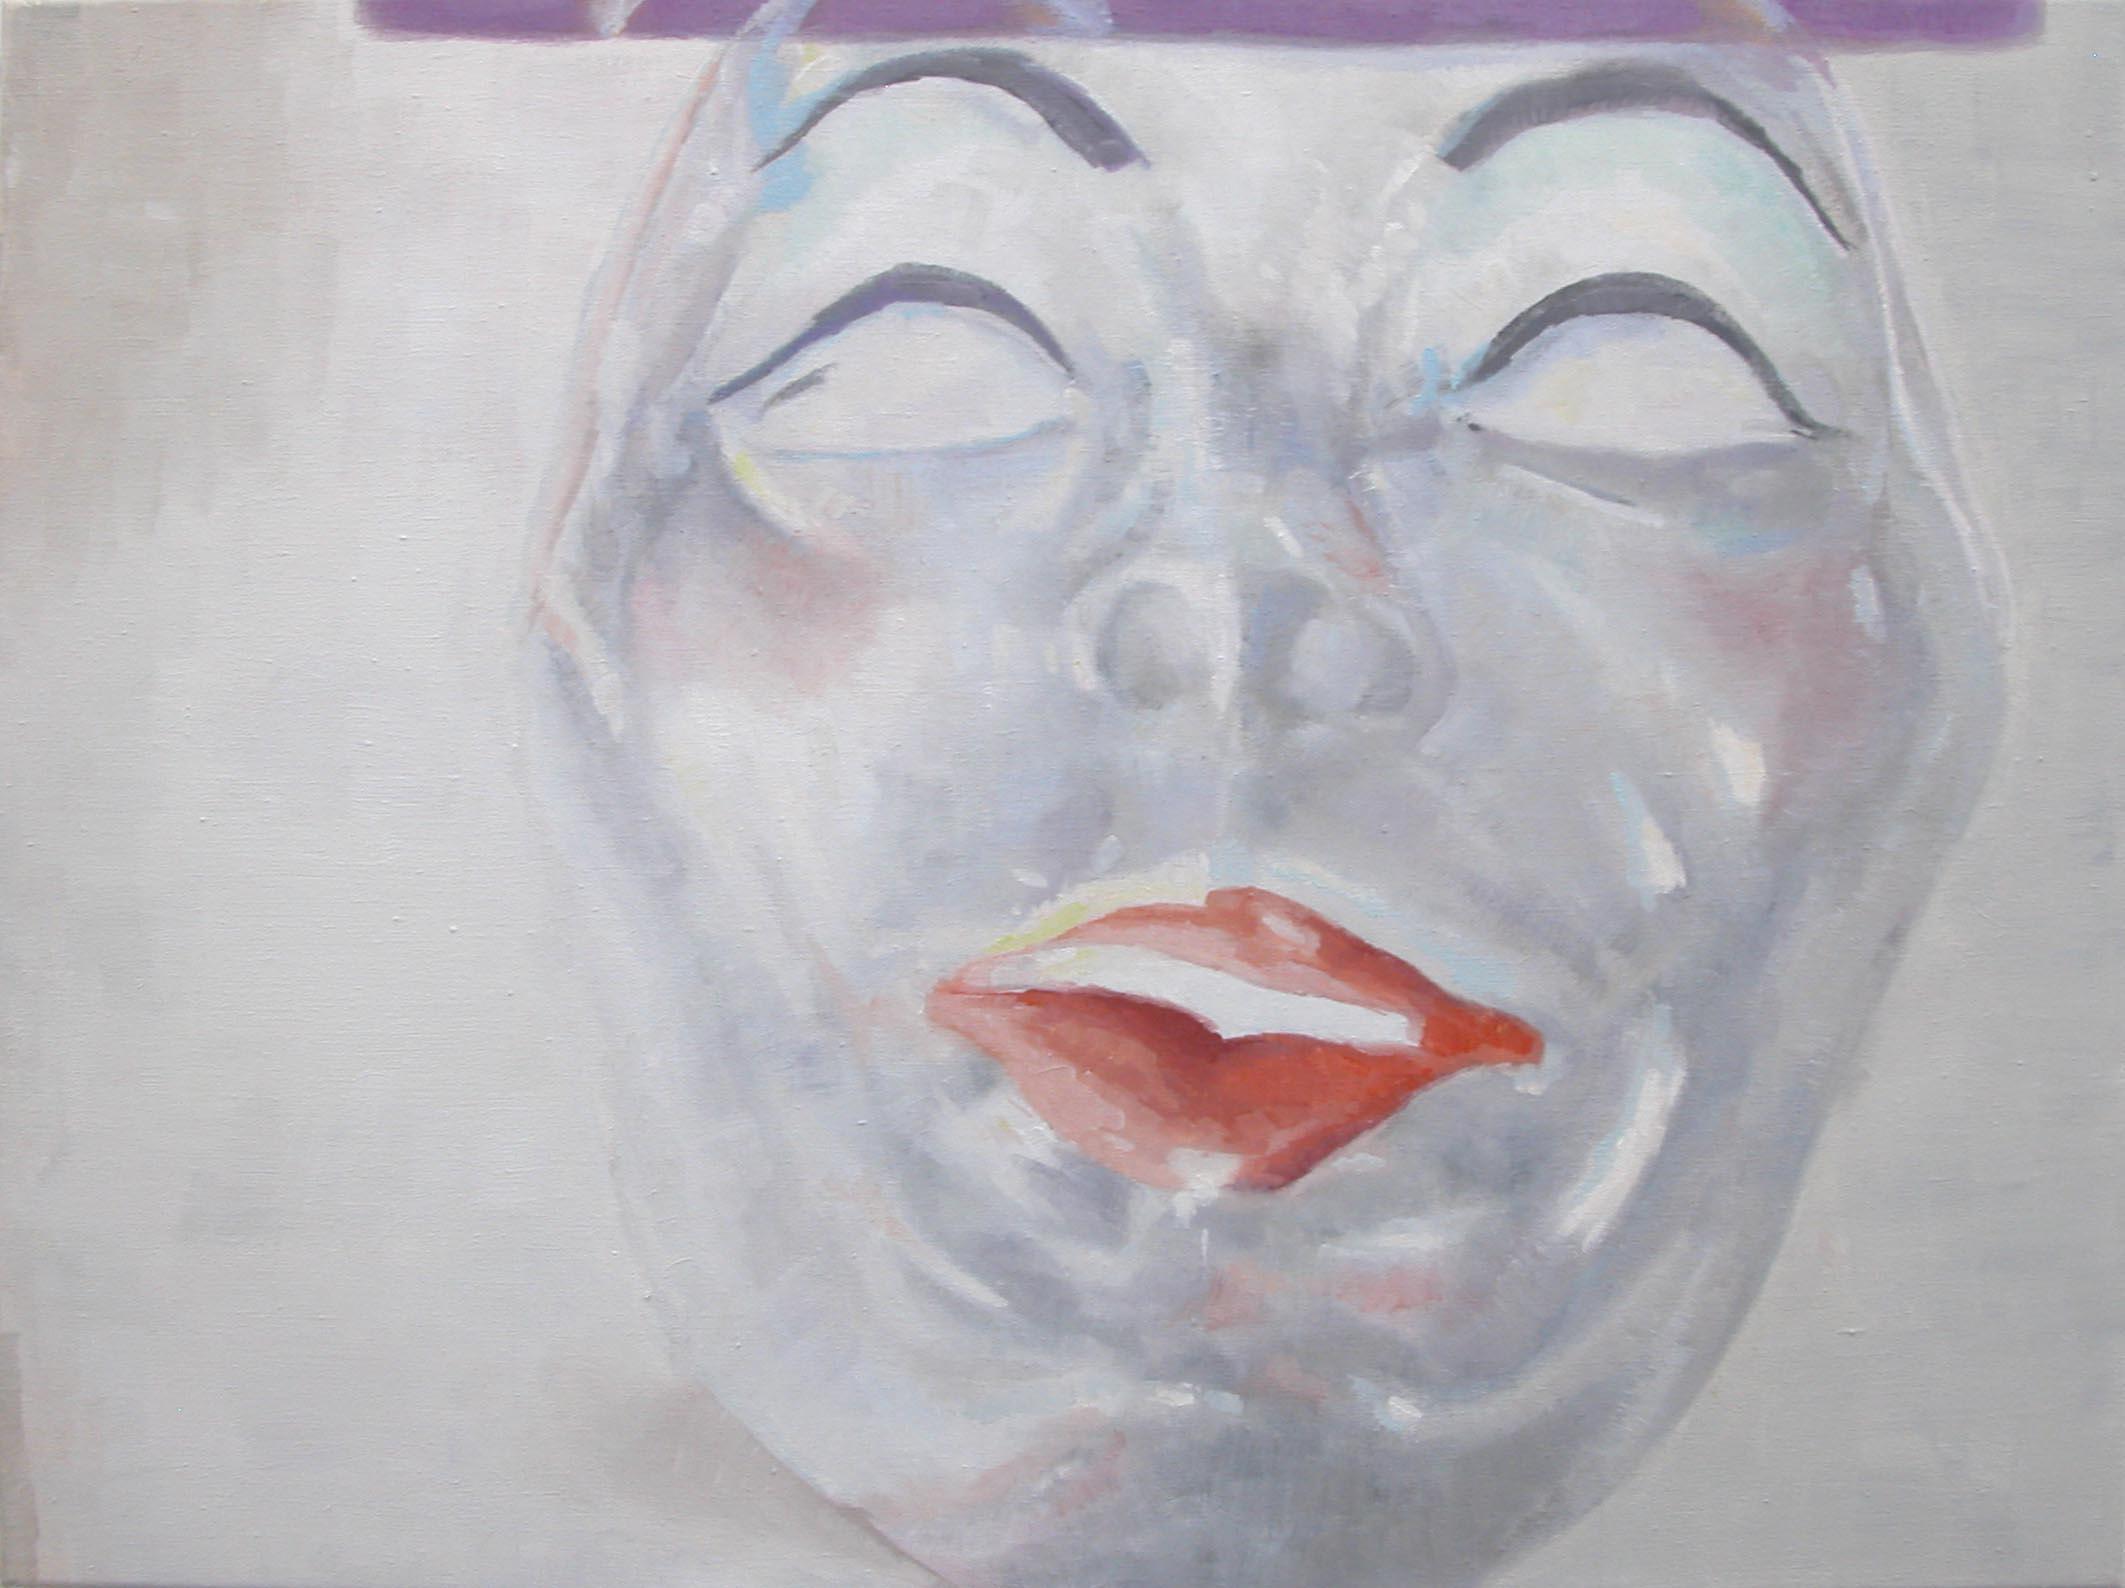 02-Chema Como Ghost Make up Baja